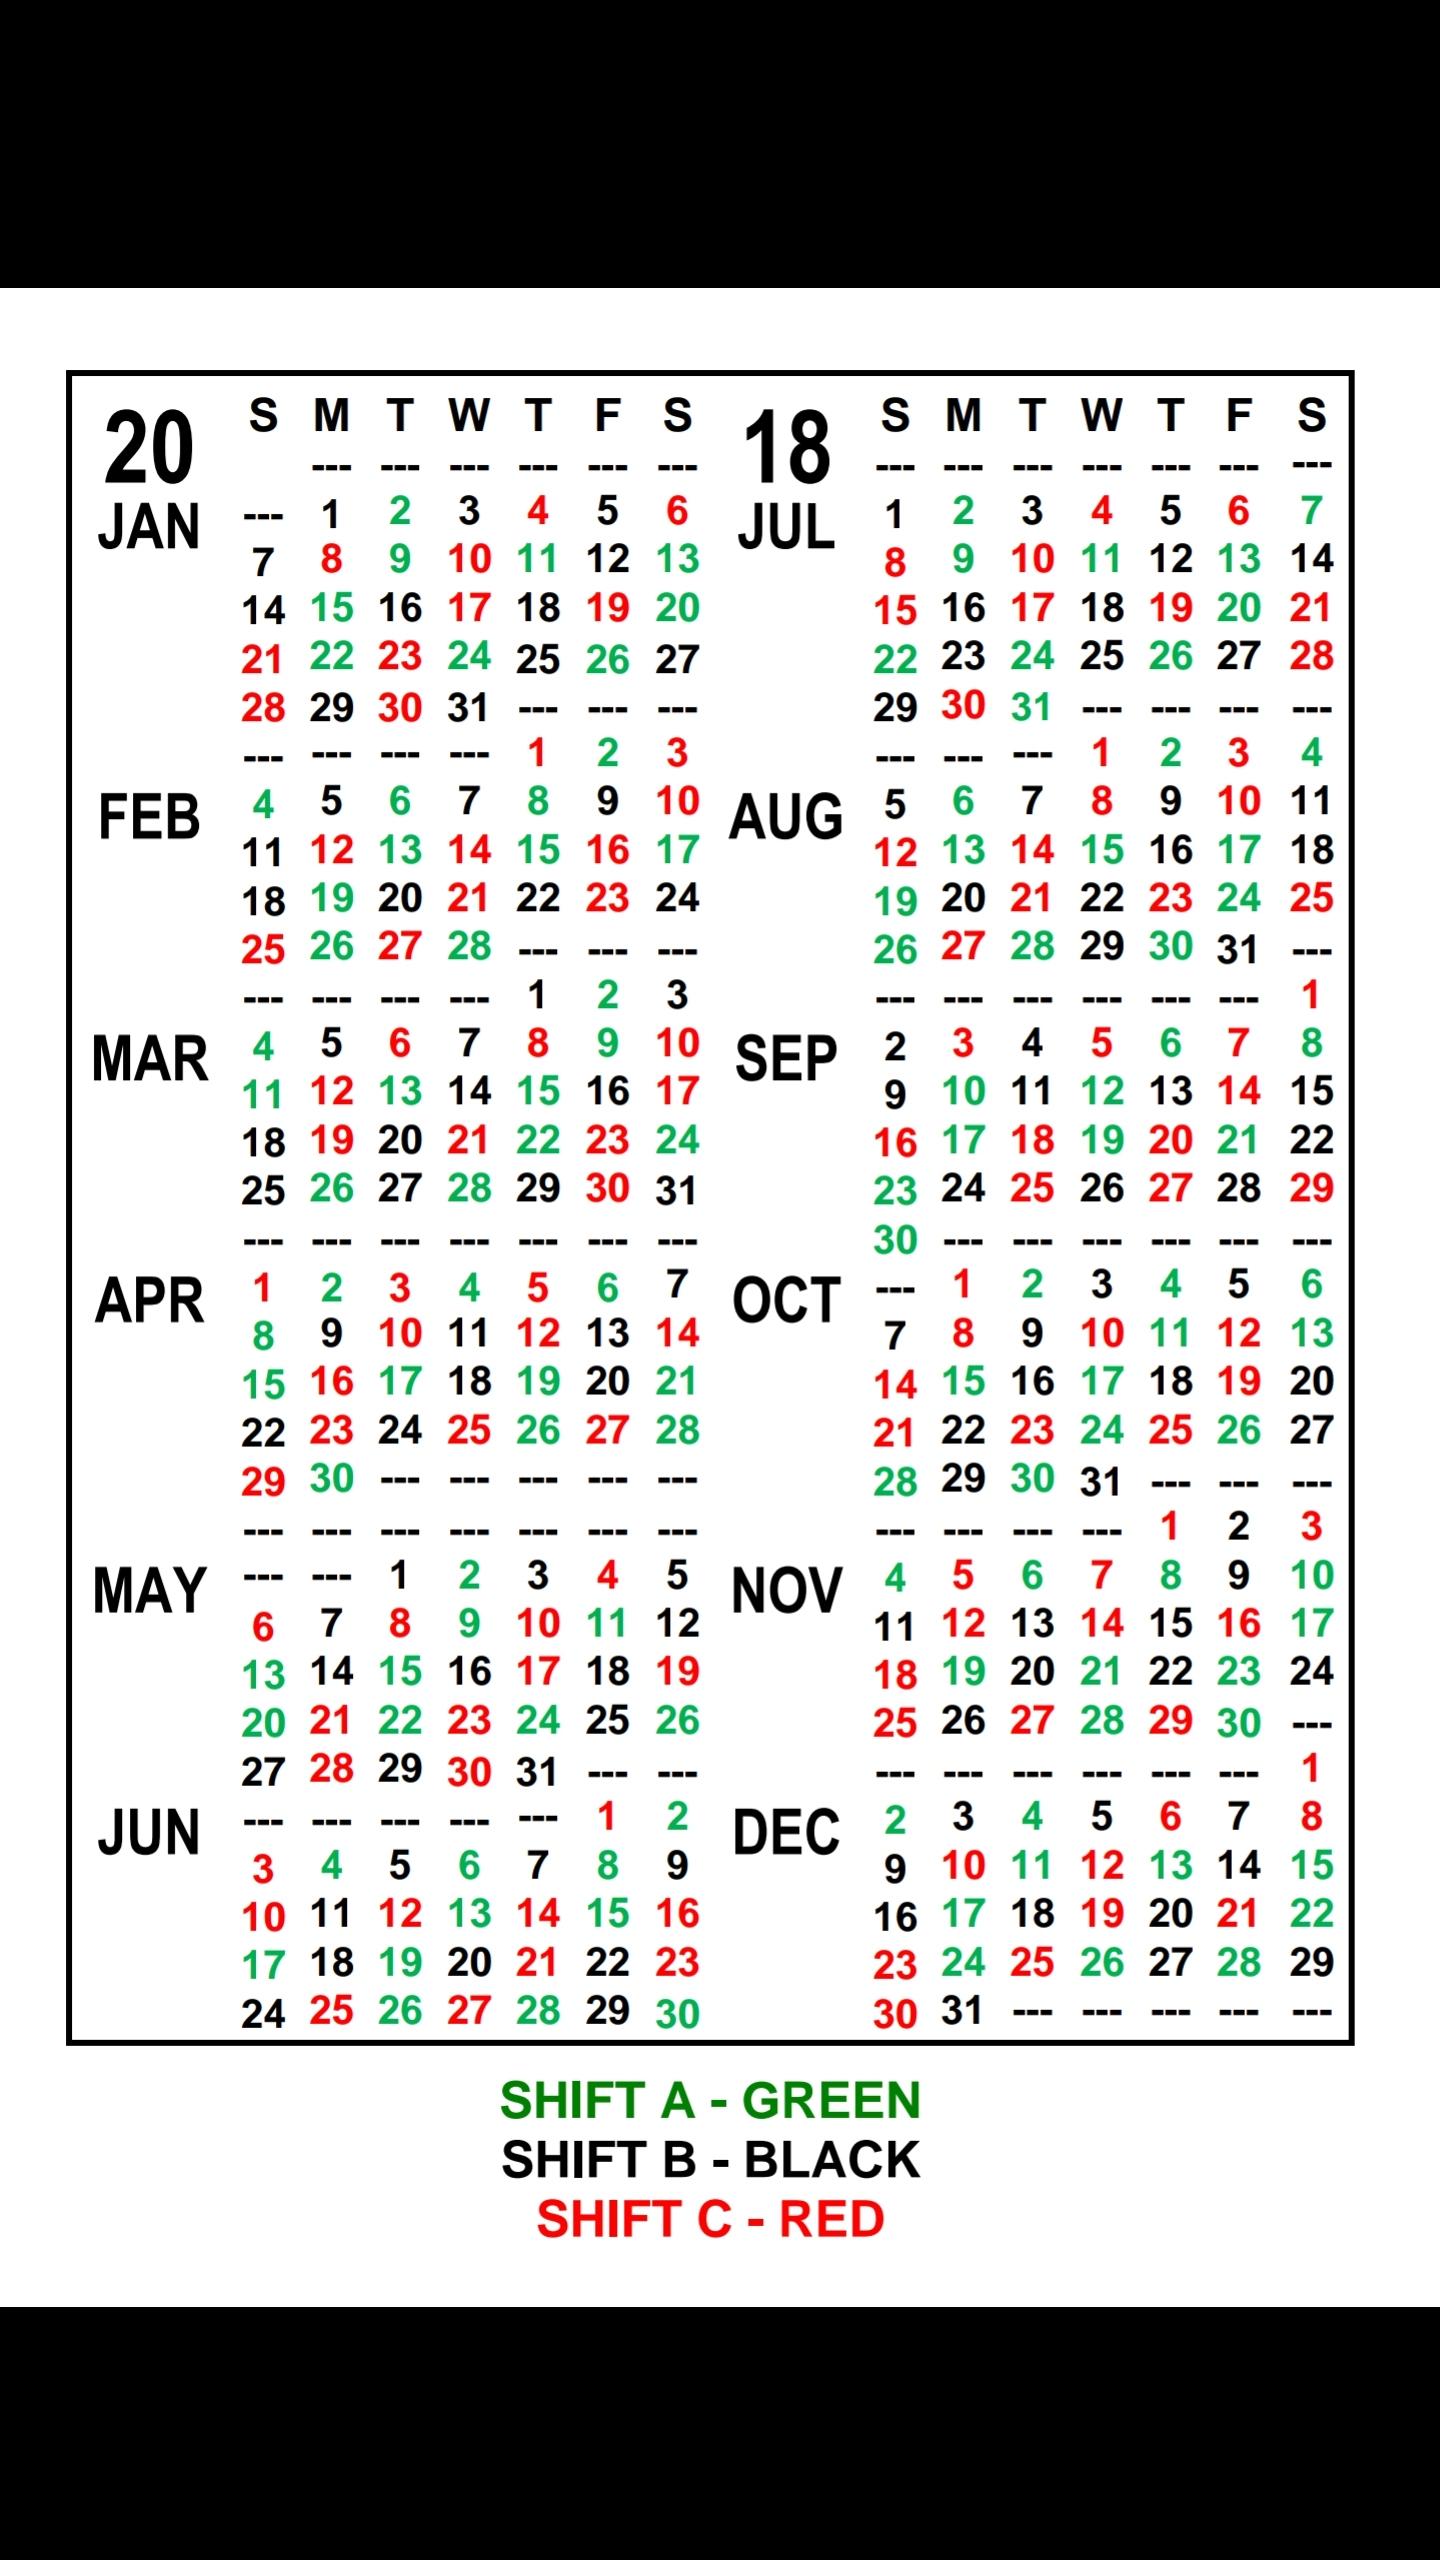 Firefighter Red Shift Calendar 2021 Printable Free